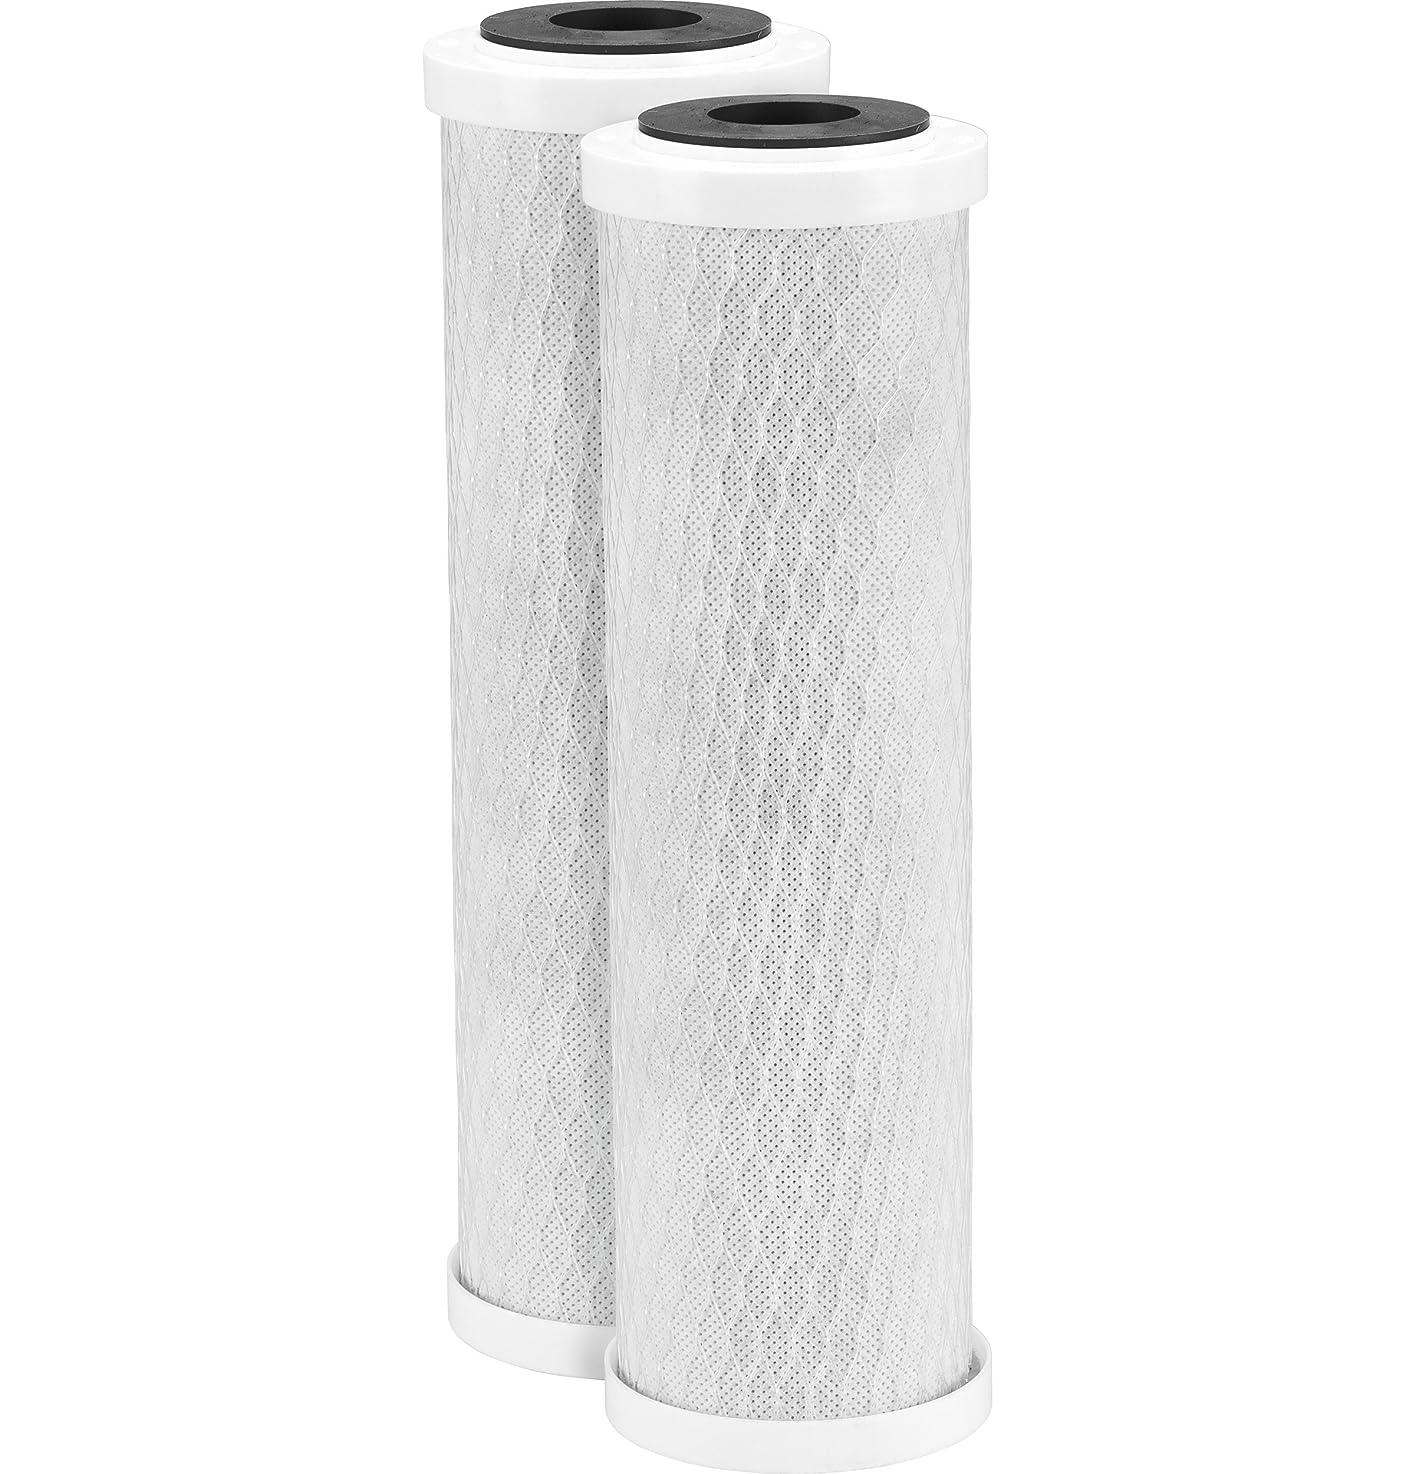 GE FX12P Reverse Osmosis Replacement Filter Set